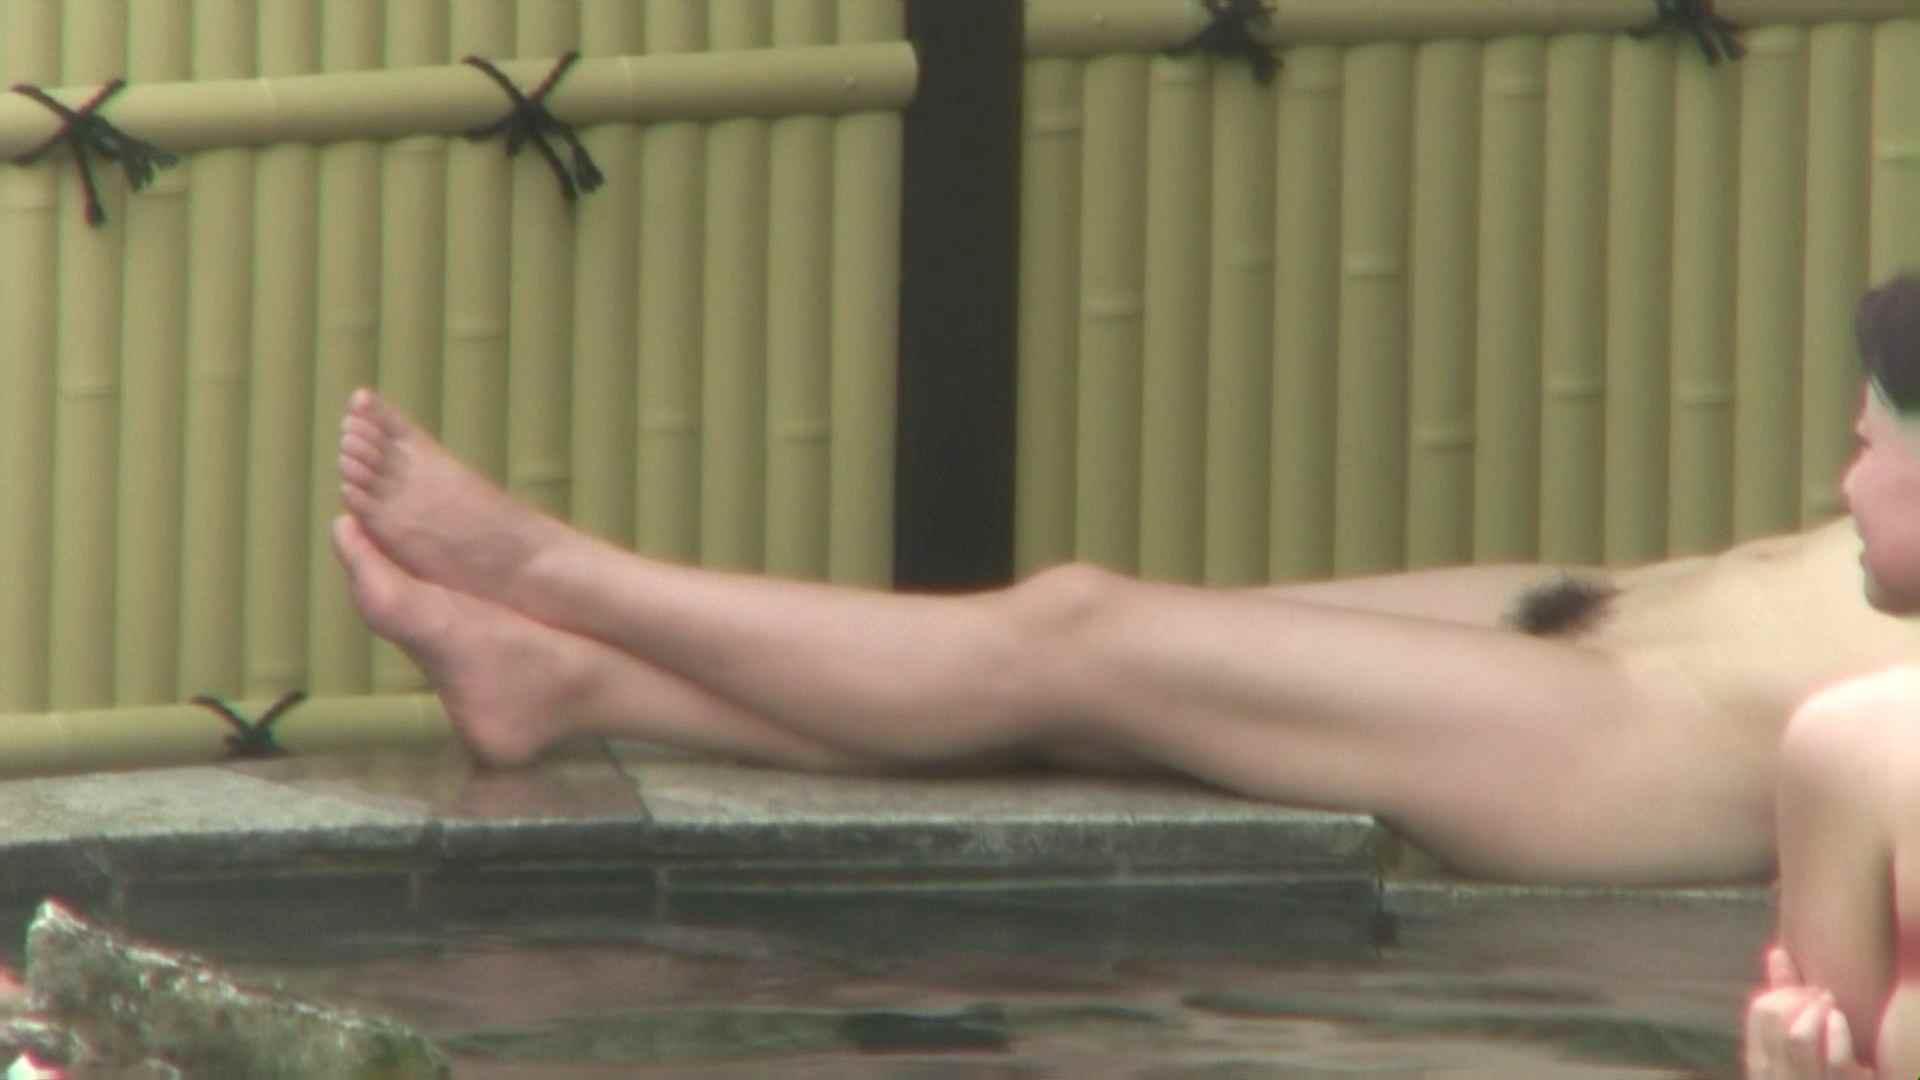 Aquaな露天風呂Vol.74【VIP限定】 露天風呂編 | 盗撮シリーズ  103PIX 11